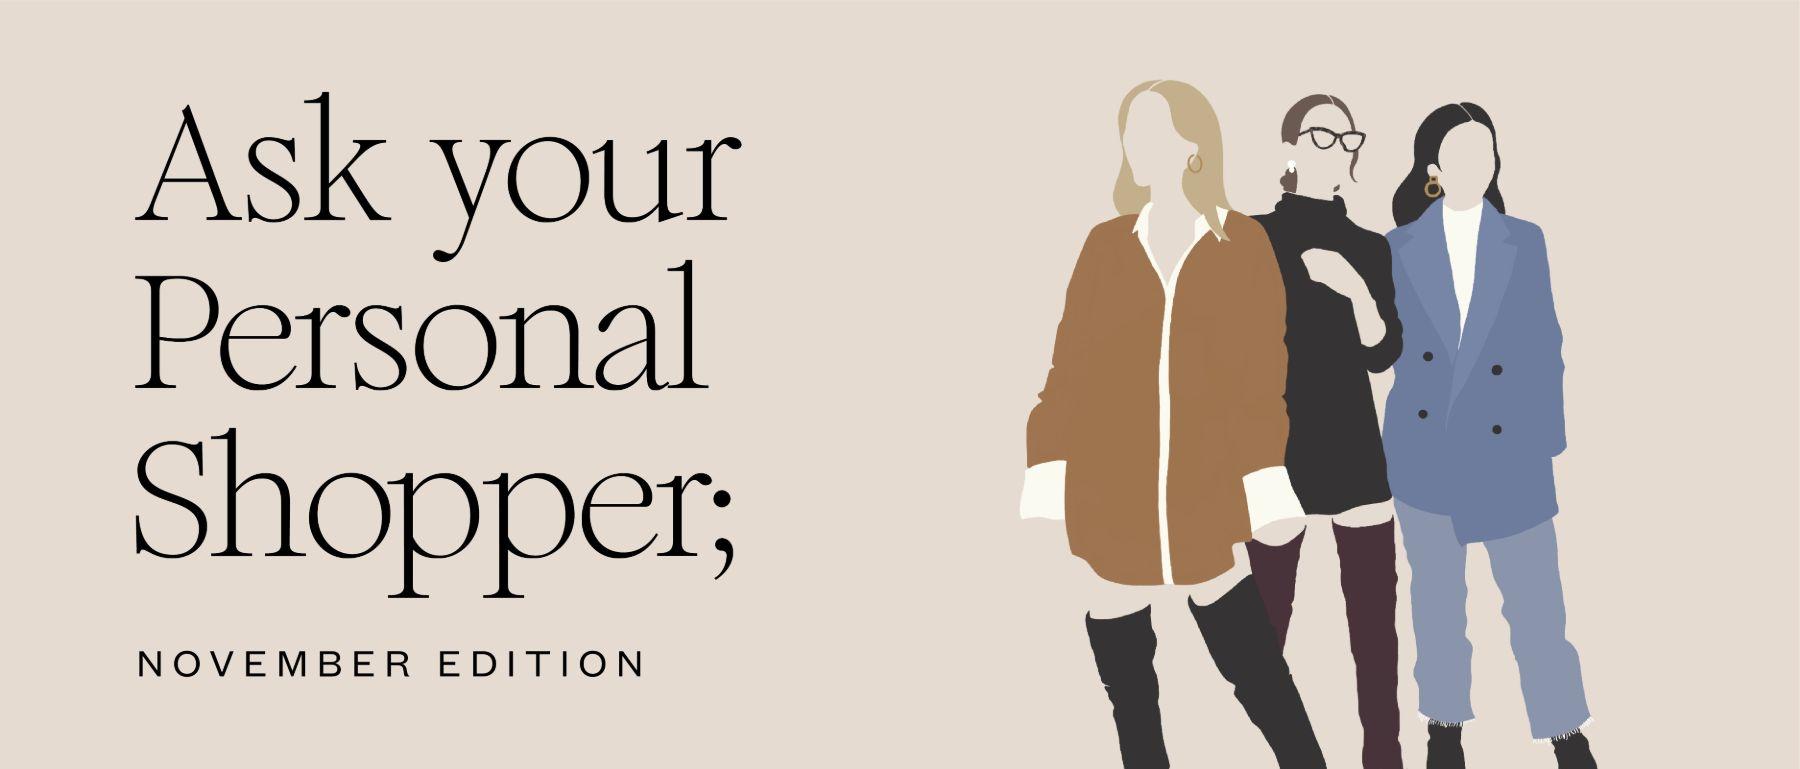 Pregunta a tu Personal shopper noviembre 2020